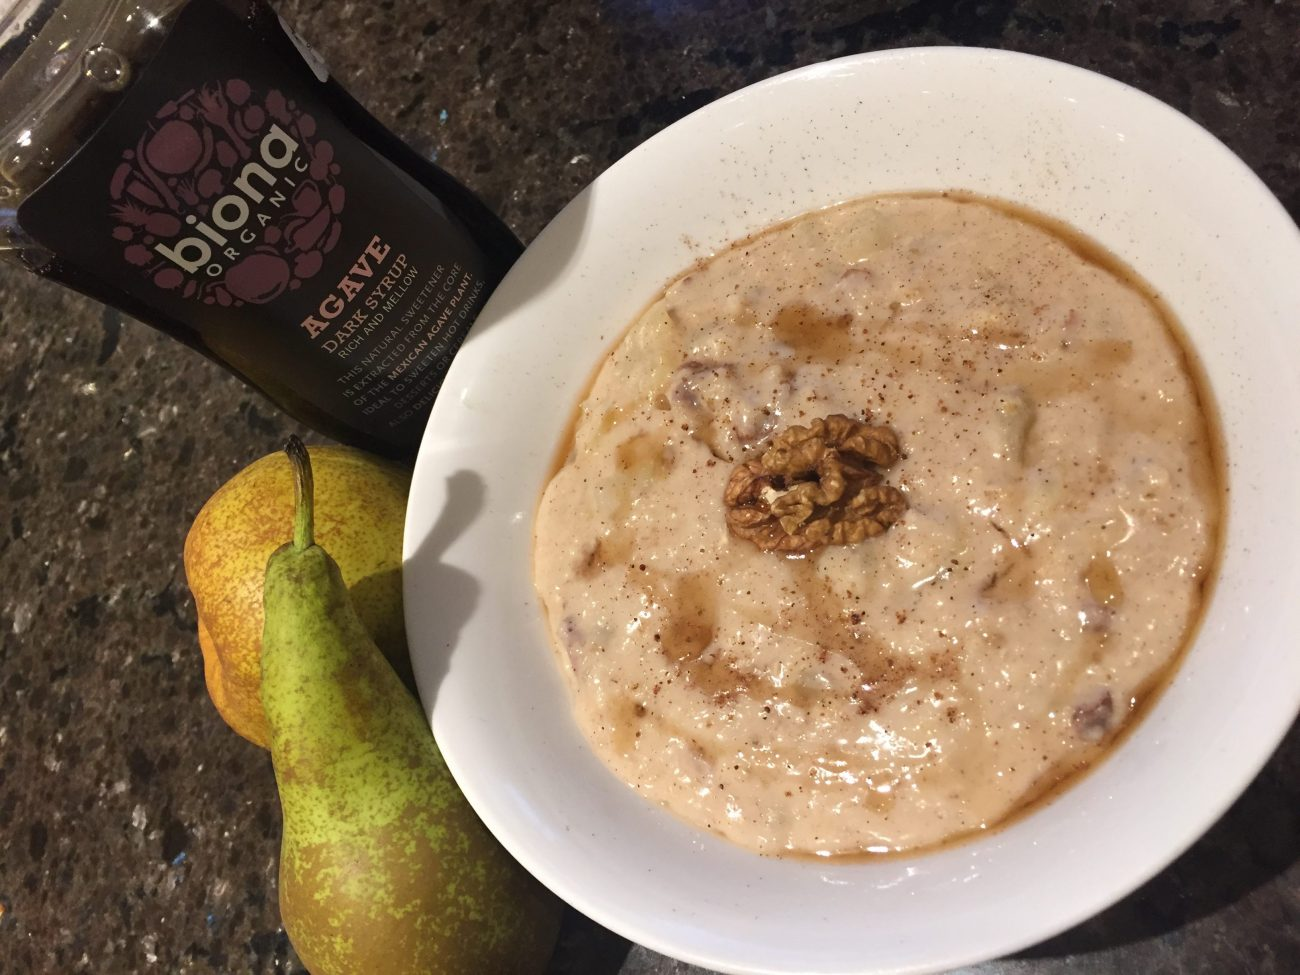 Pear & Walnut Porridge